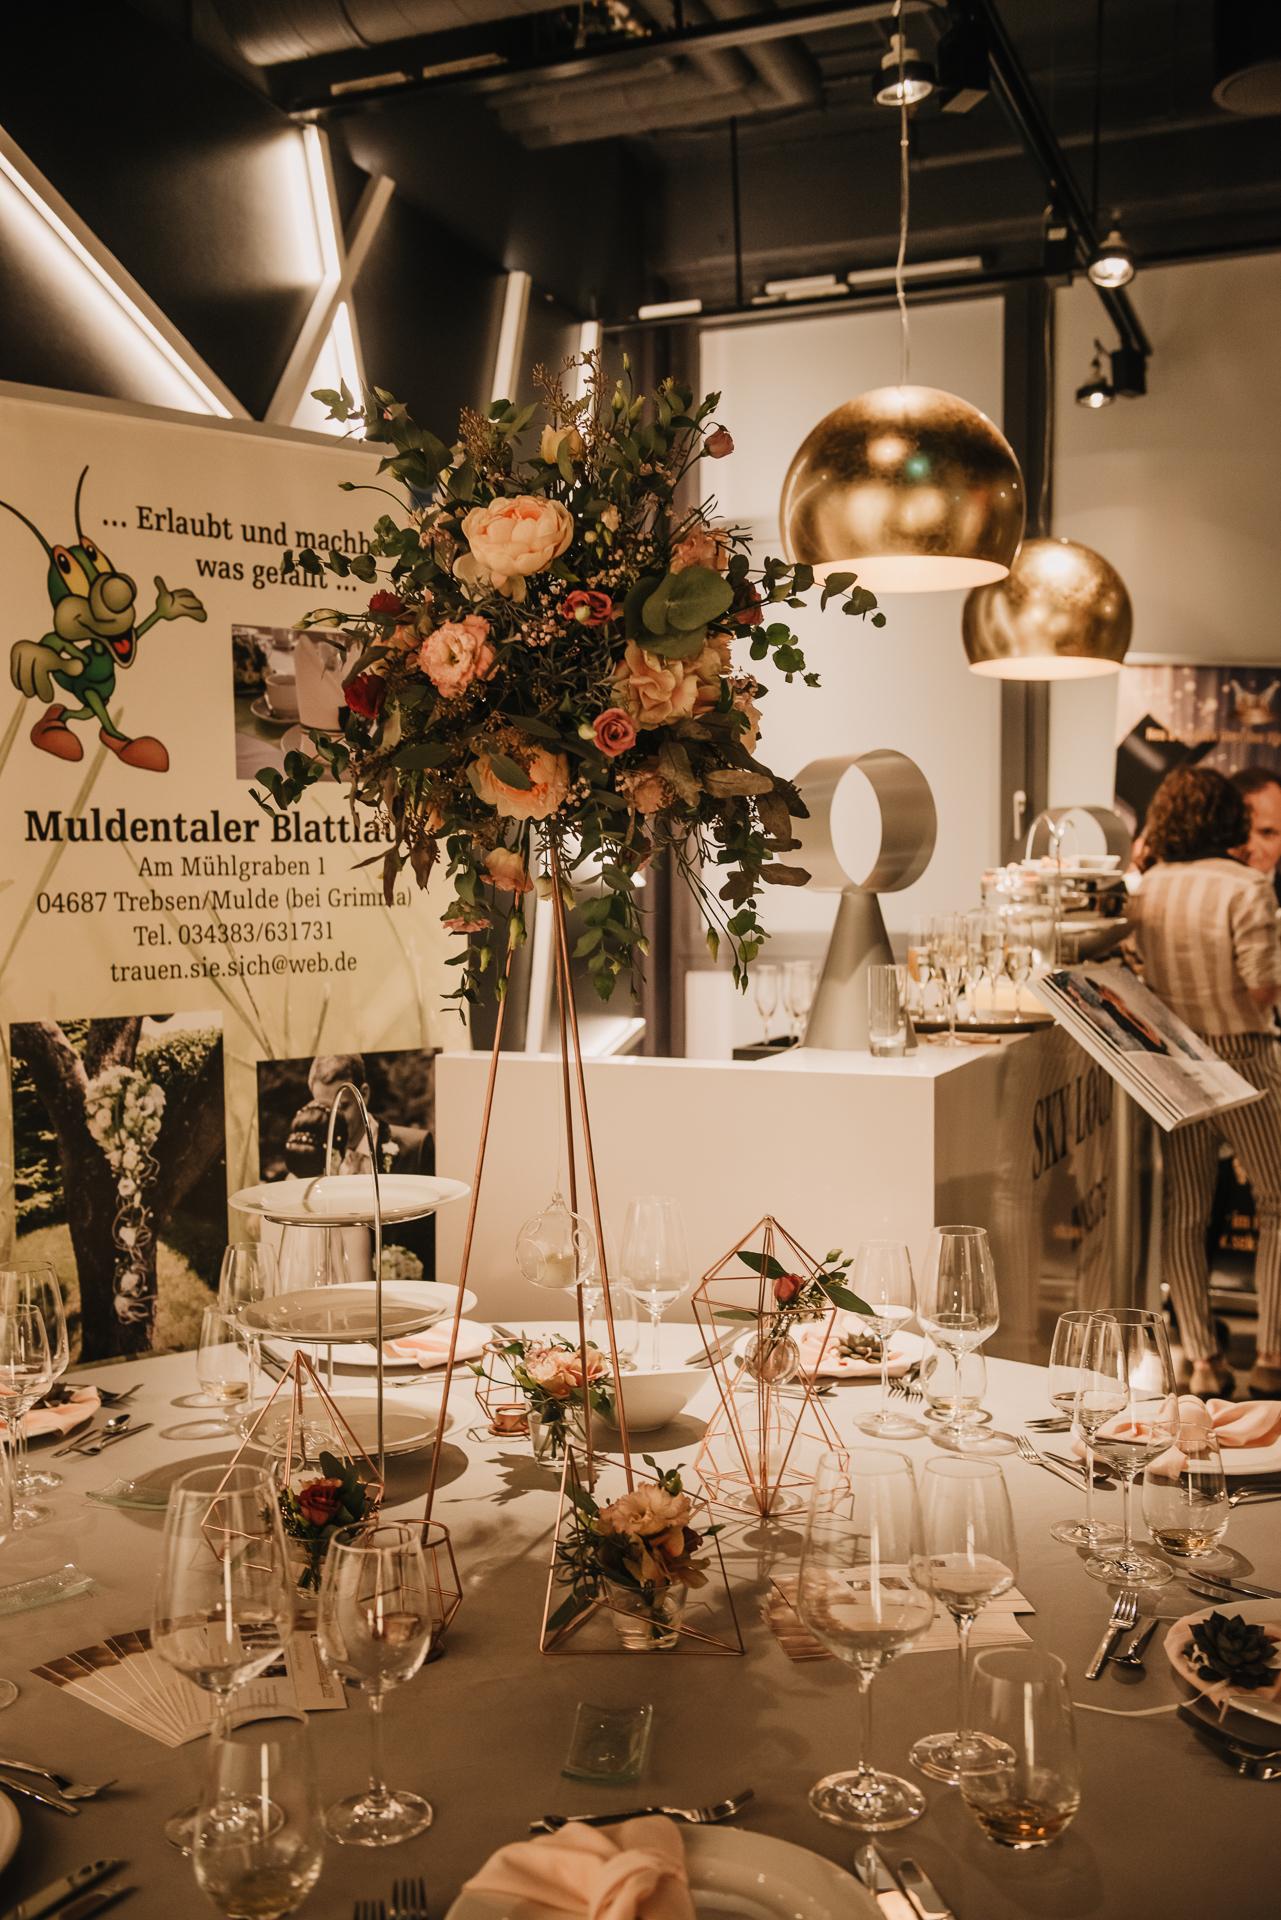 Zweinander-LeonoreHerzog-WeddingMarket-OnTour20191110-9724